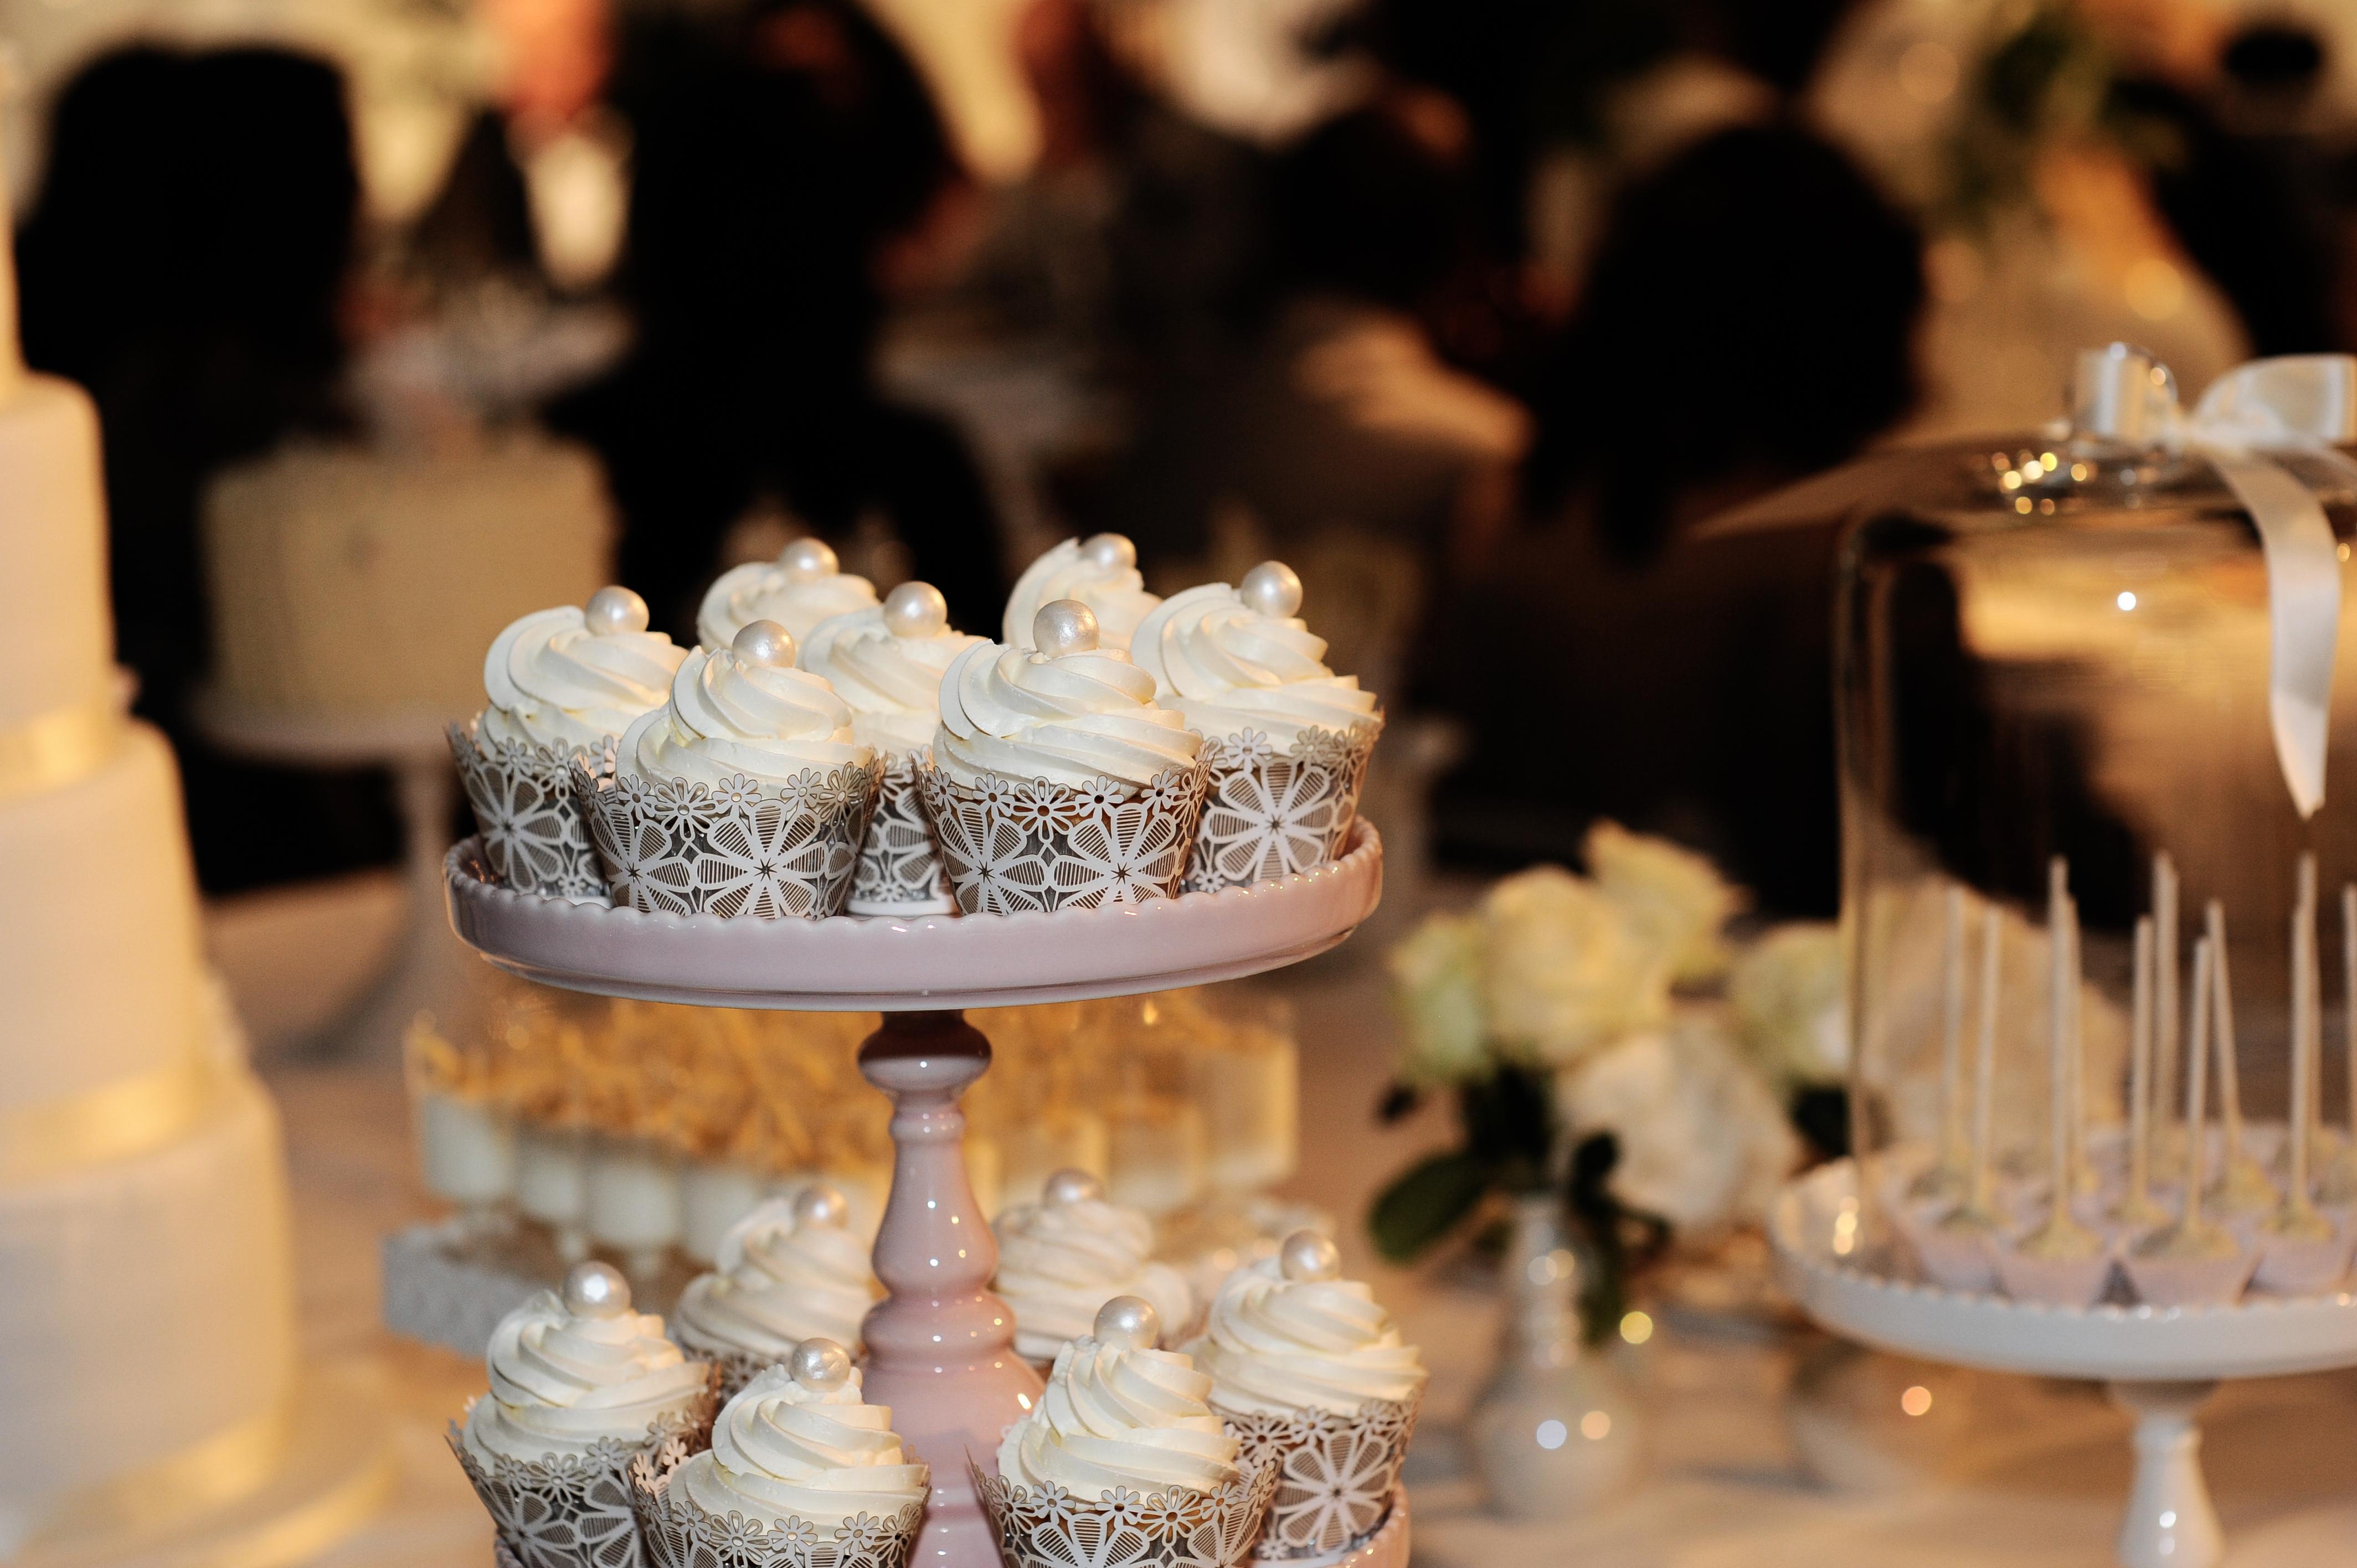 cupcakes-LiseloreChevalier1